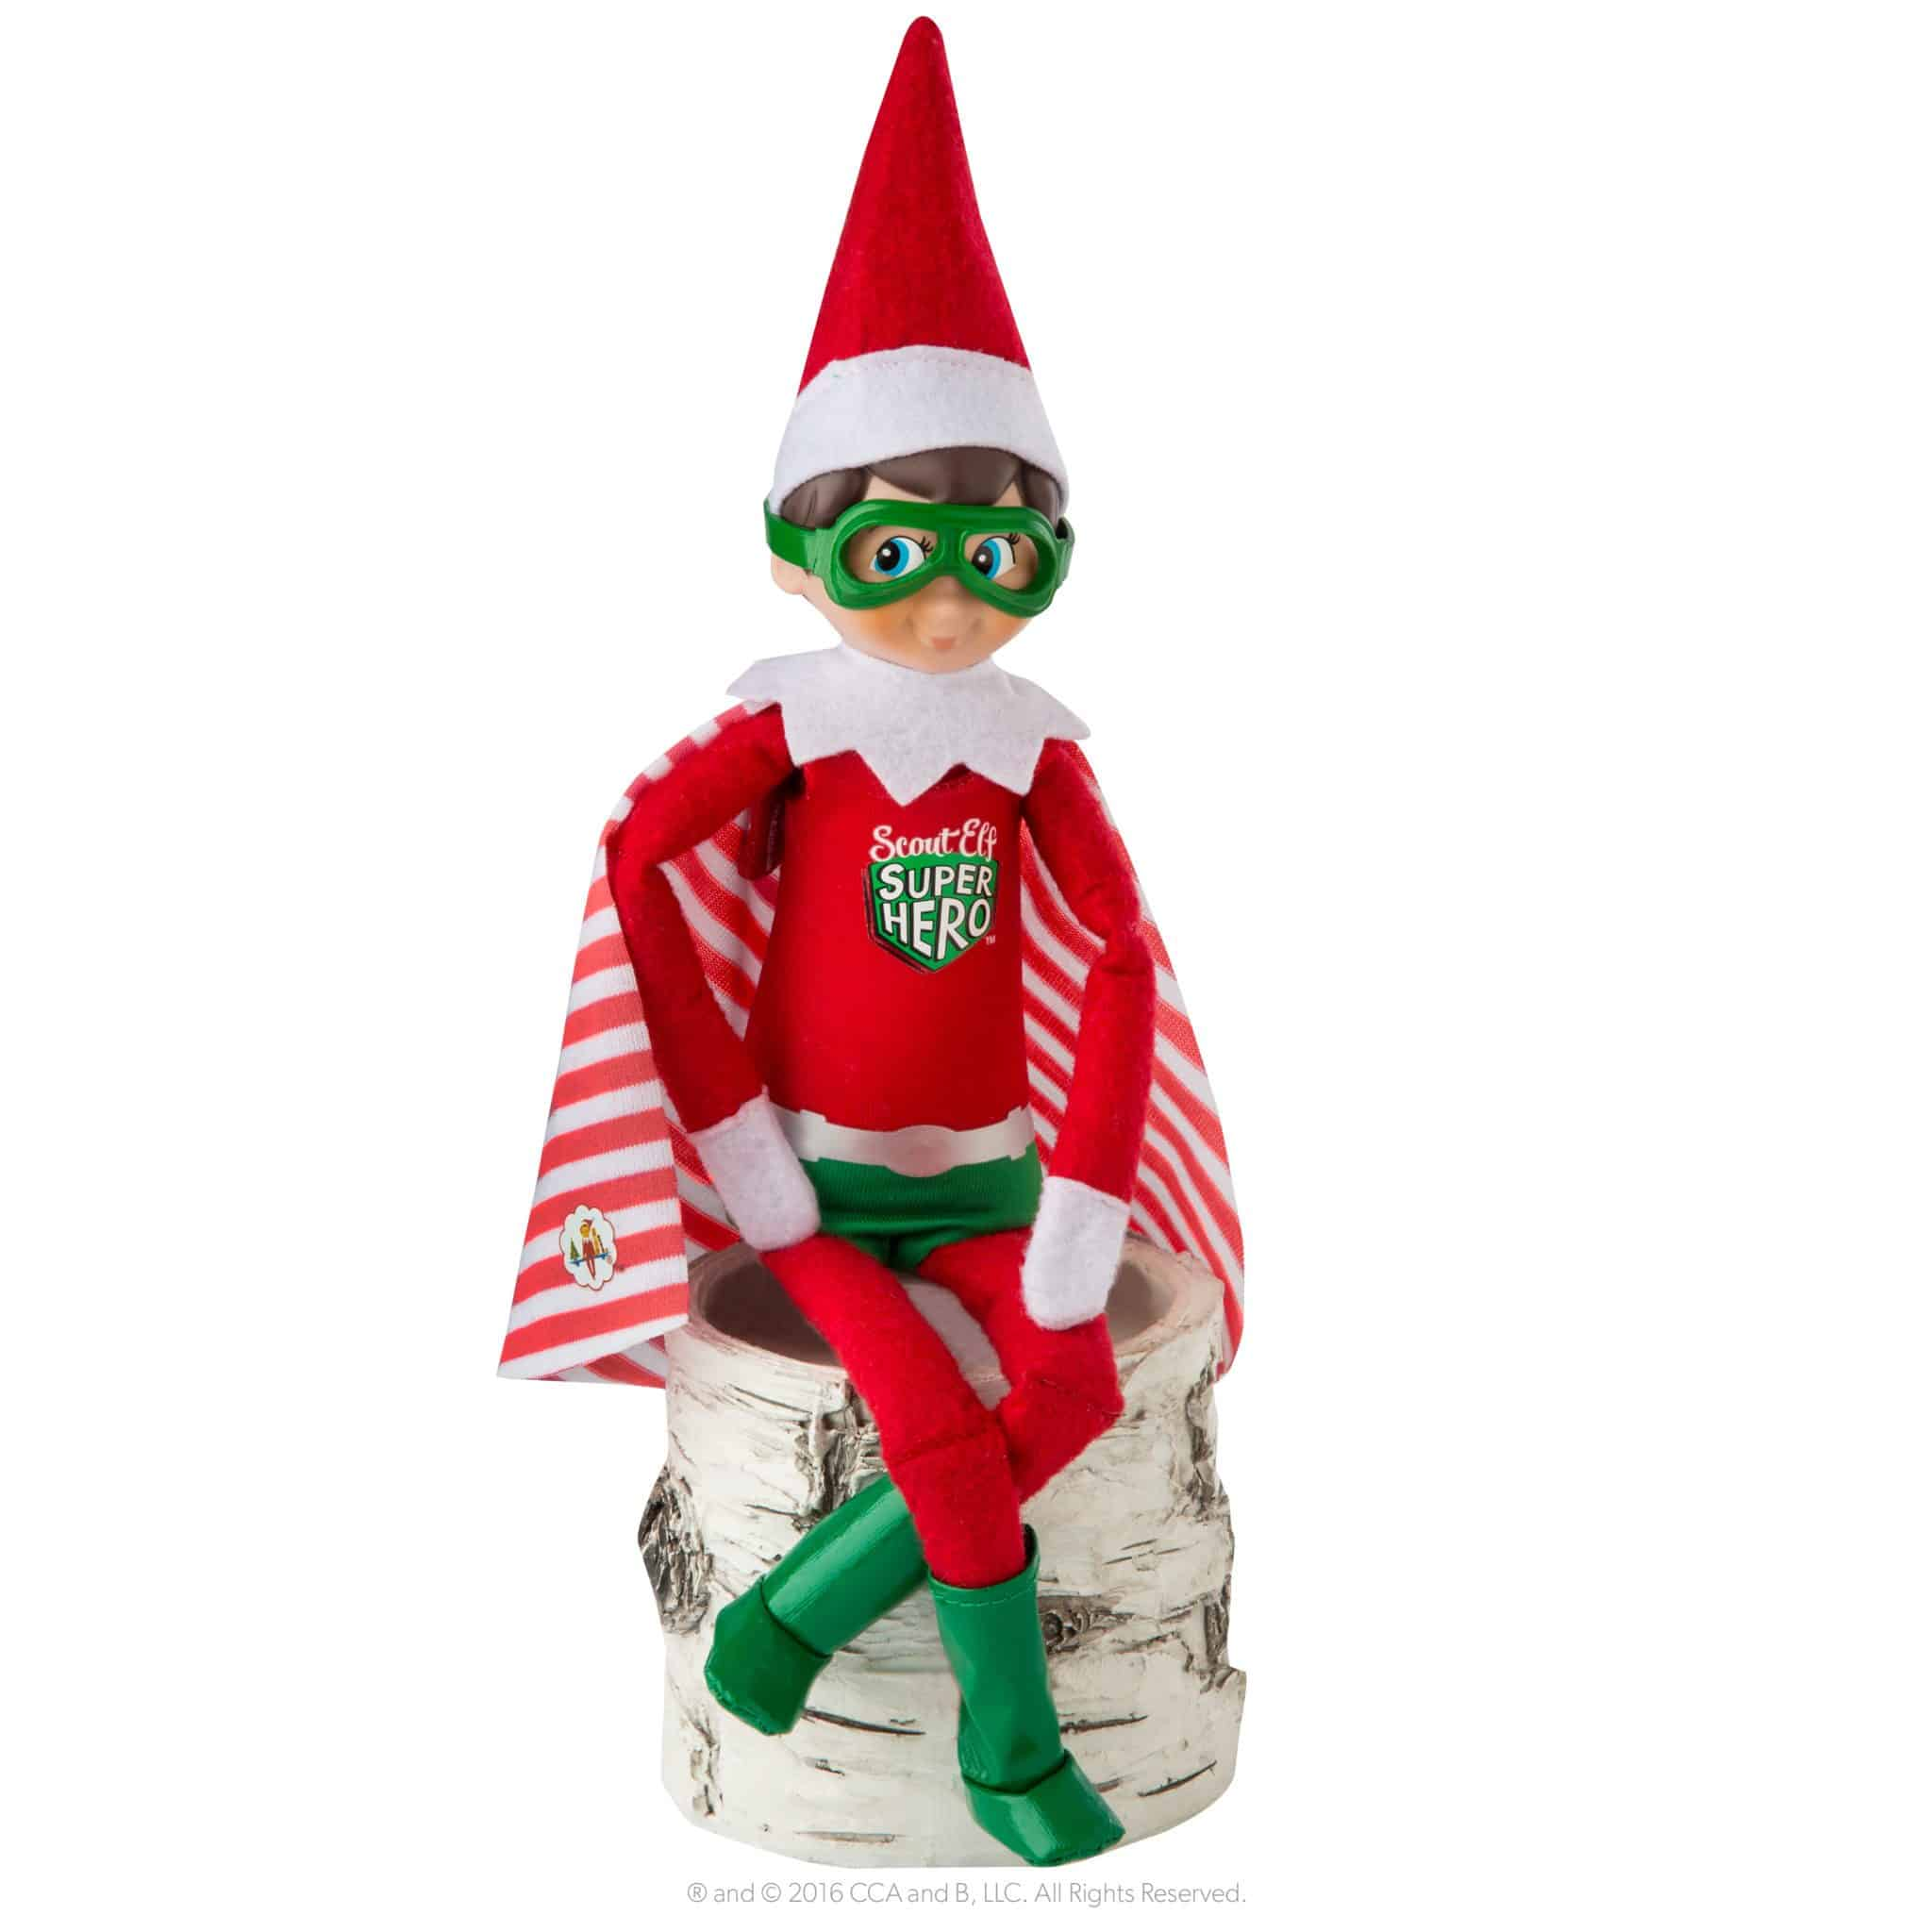 Elf on the shelf superhero costume